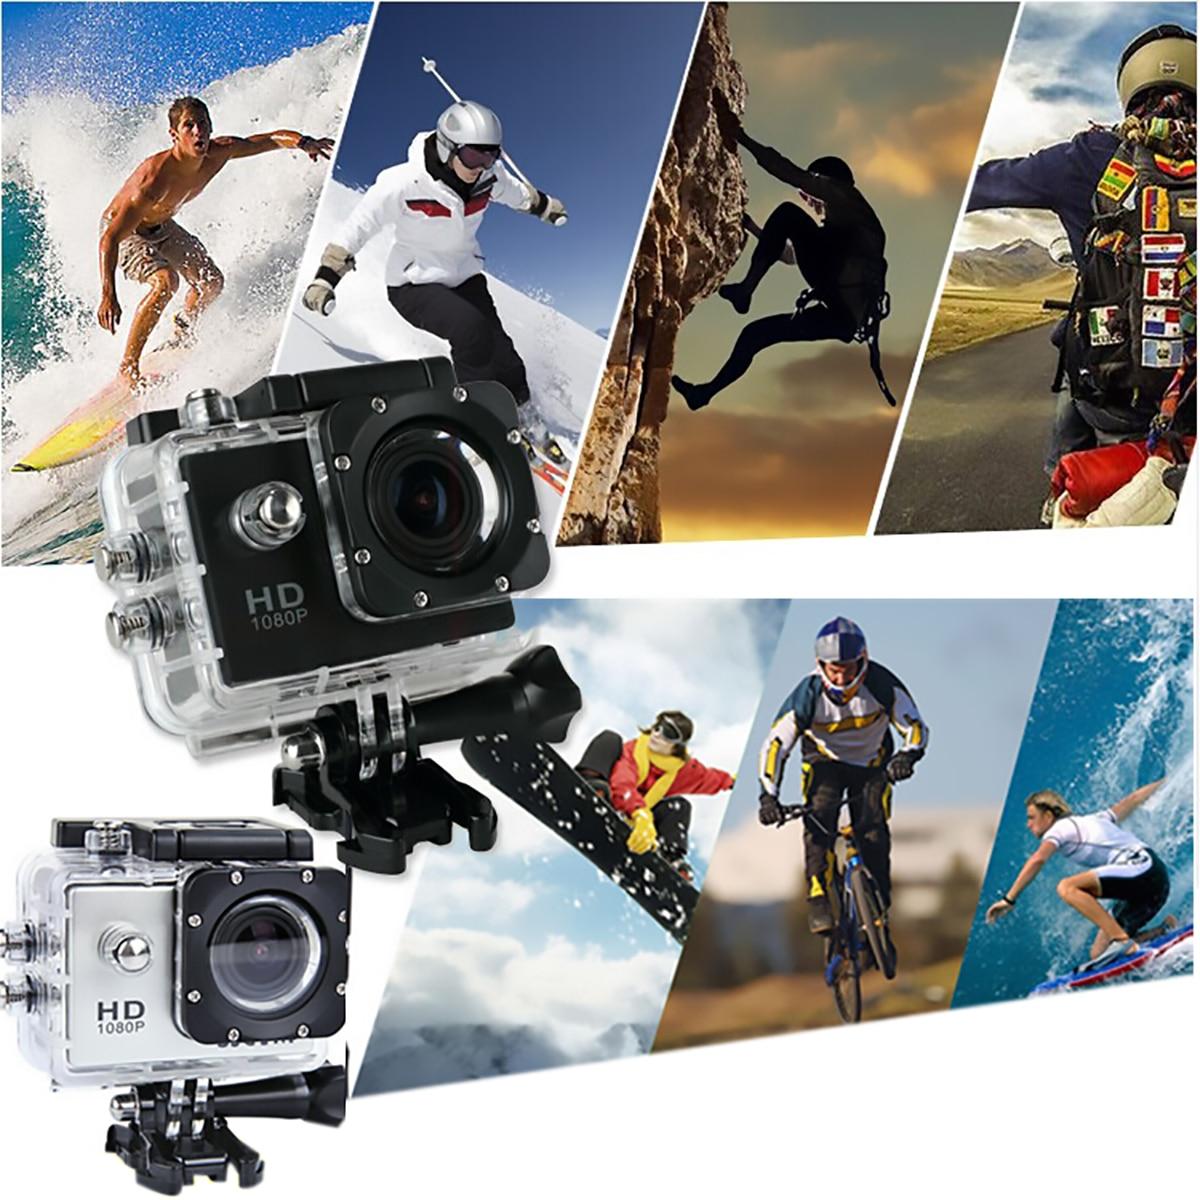 Cámara deportiva 1080P HD 4 K/30fps Cámara de Acción para deportes al aire libre bicicletas motocicleta montañismo paracaídas para deportes extremos